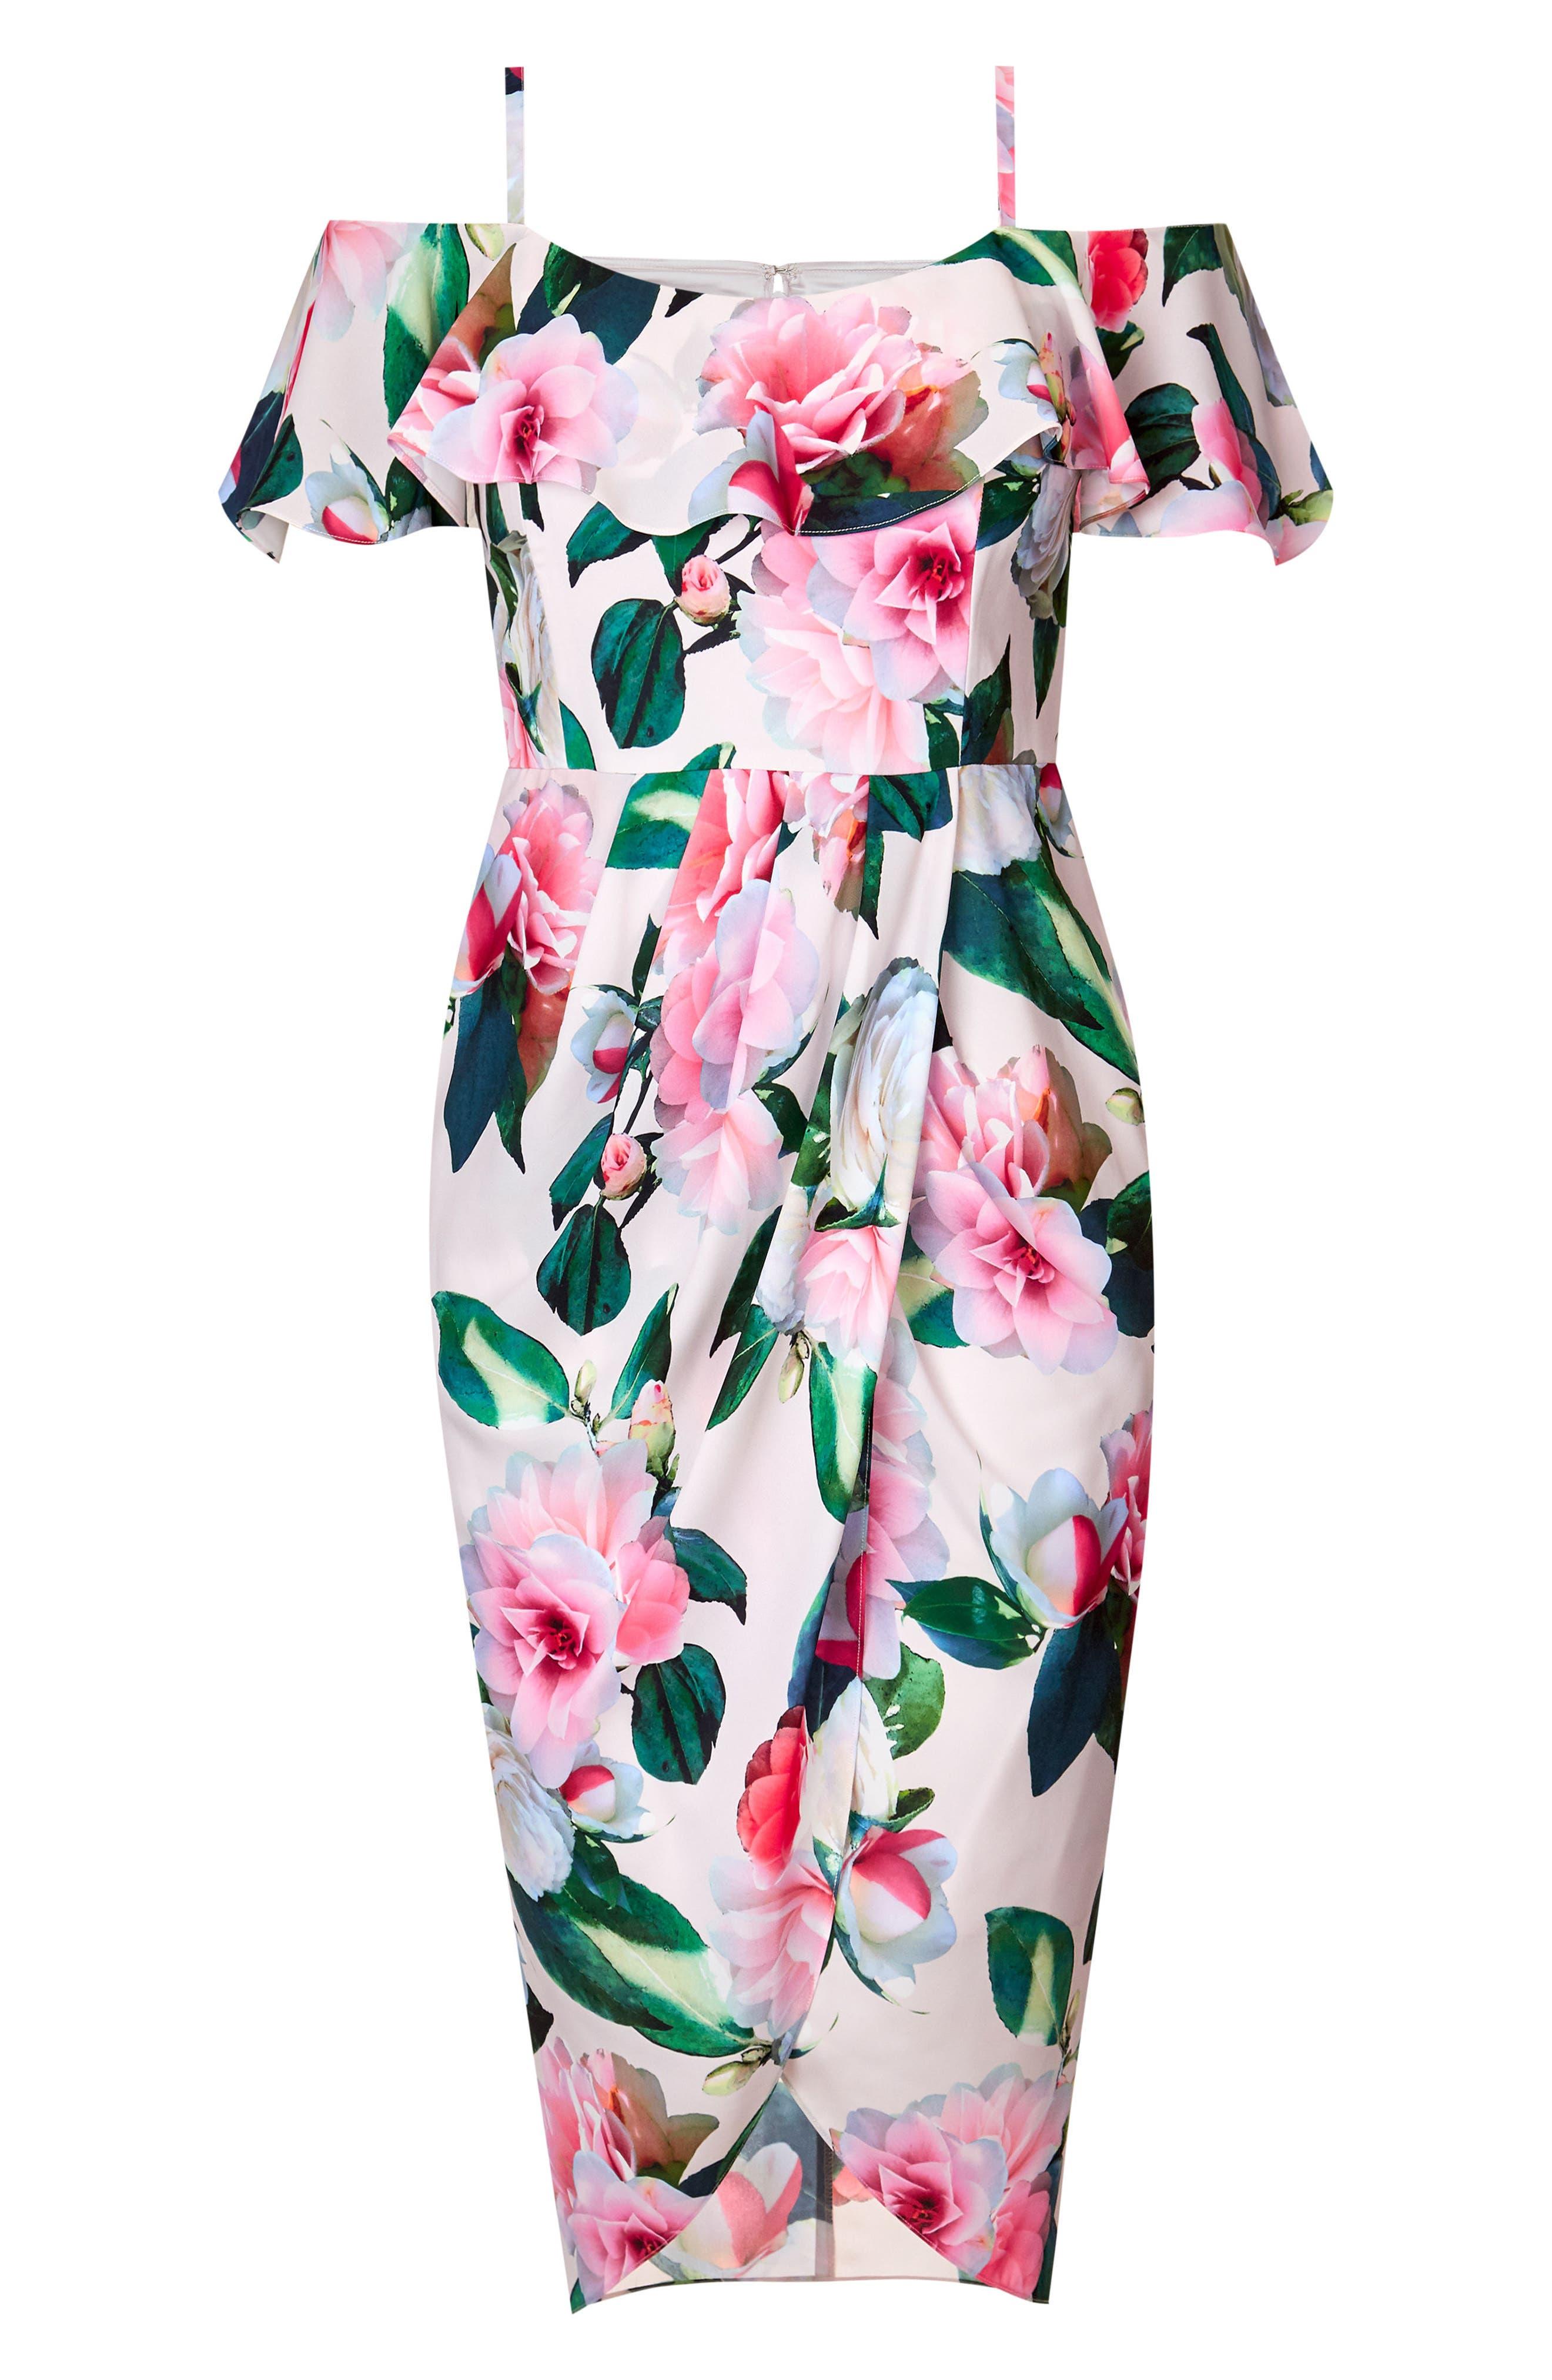 Love Me Do Floral Cold Shoulder Dress,                             Alternate thumbnail 3, color,                             651